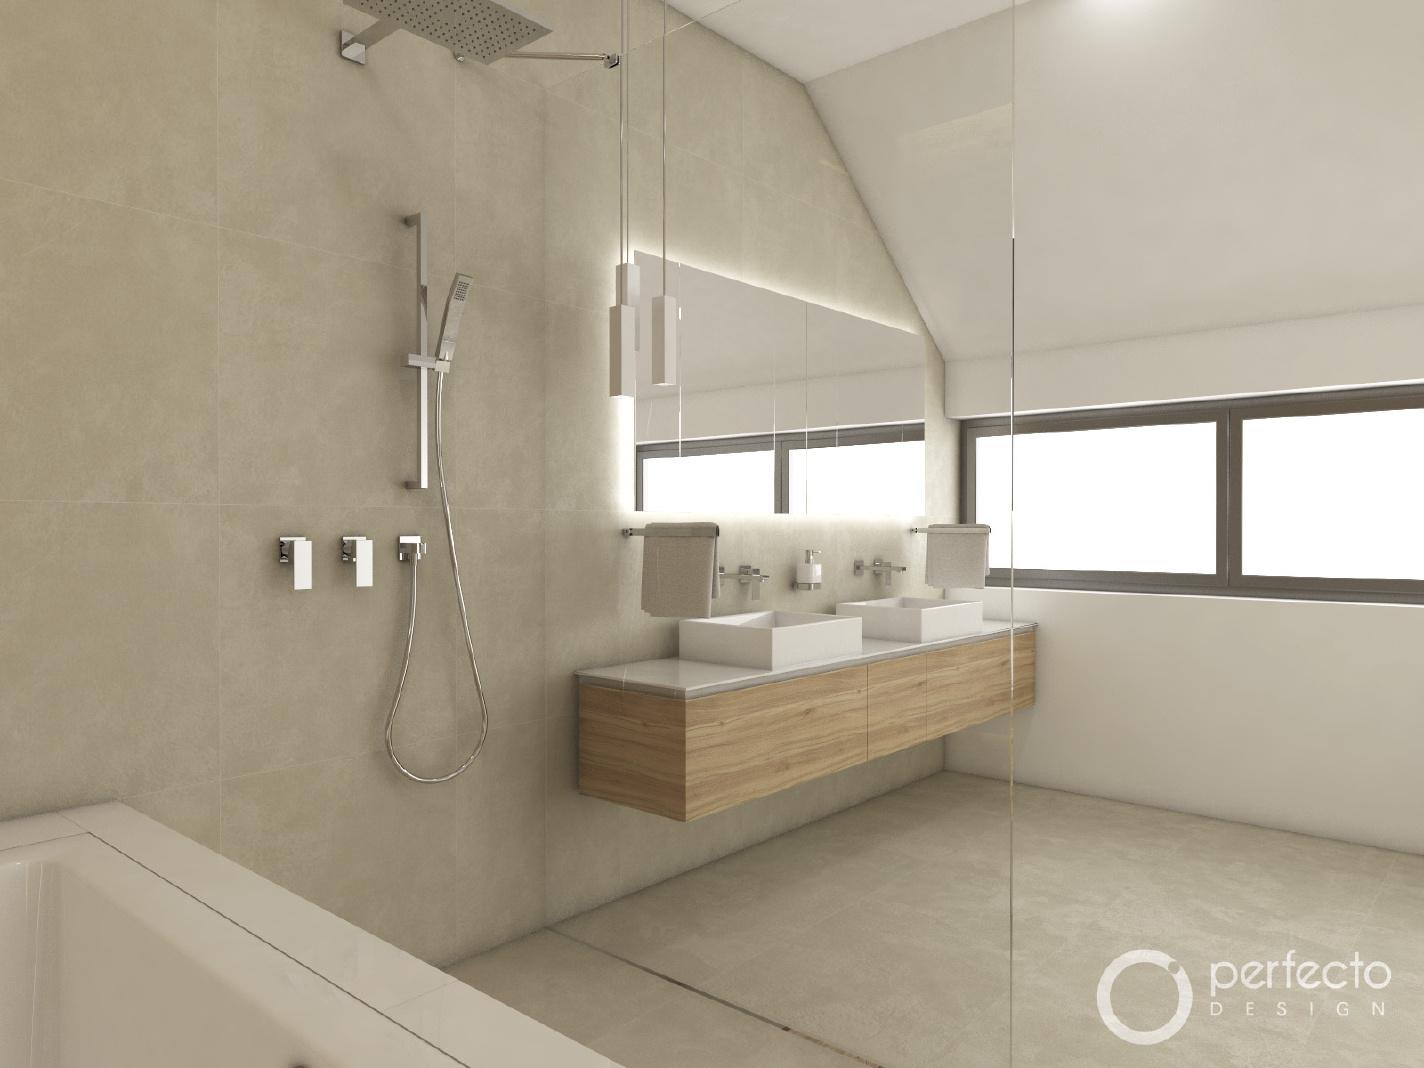 modernes badezimmer sand | perfecto design - Modernes Badezimmer